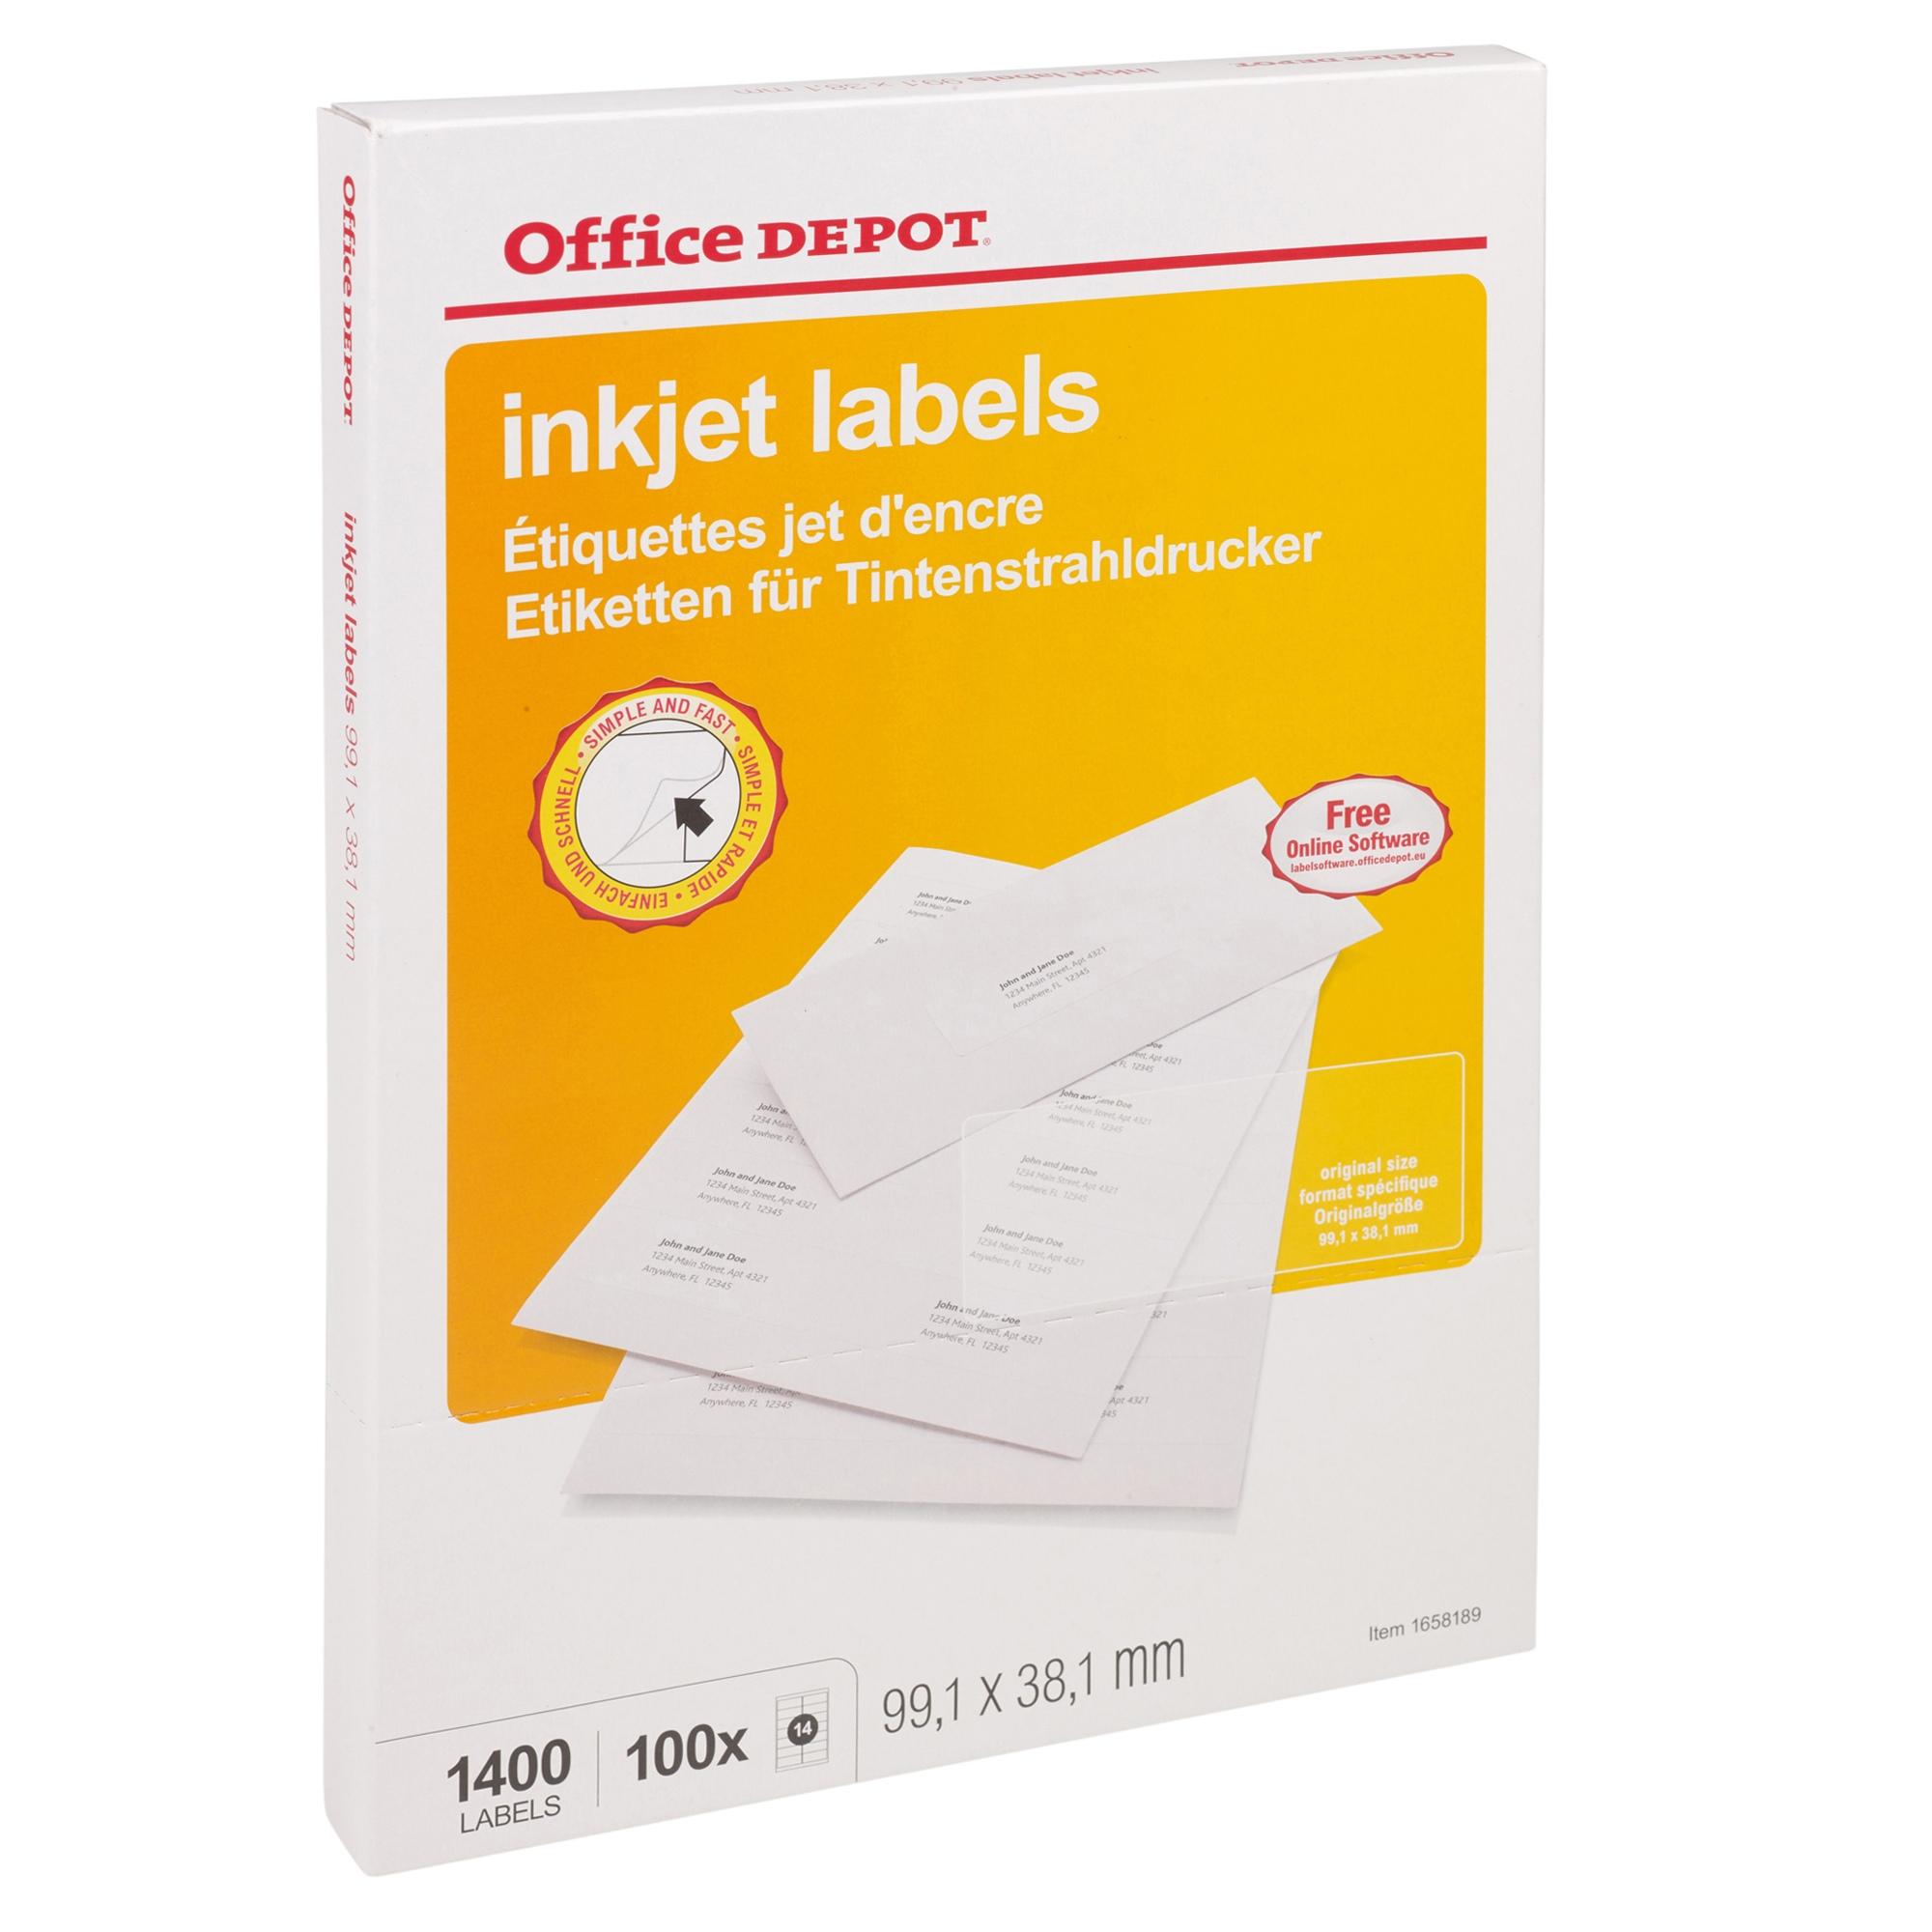 1-80 PER SHEET A4 STICKY PEEL SELF ADHESIVE ADDRESS LABELS LASER INKJET COPIER